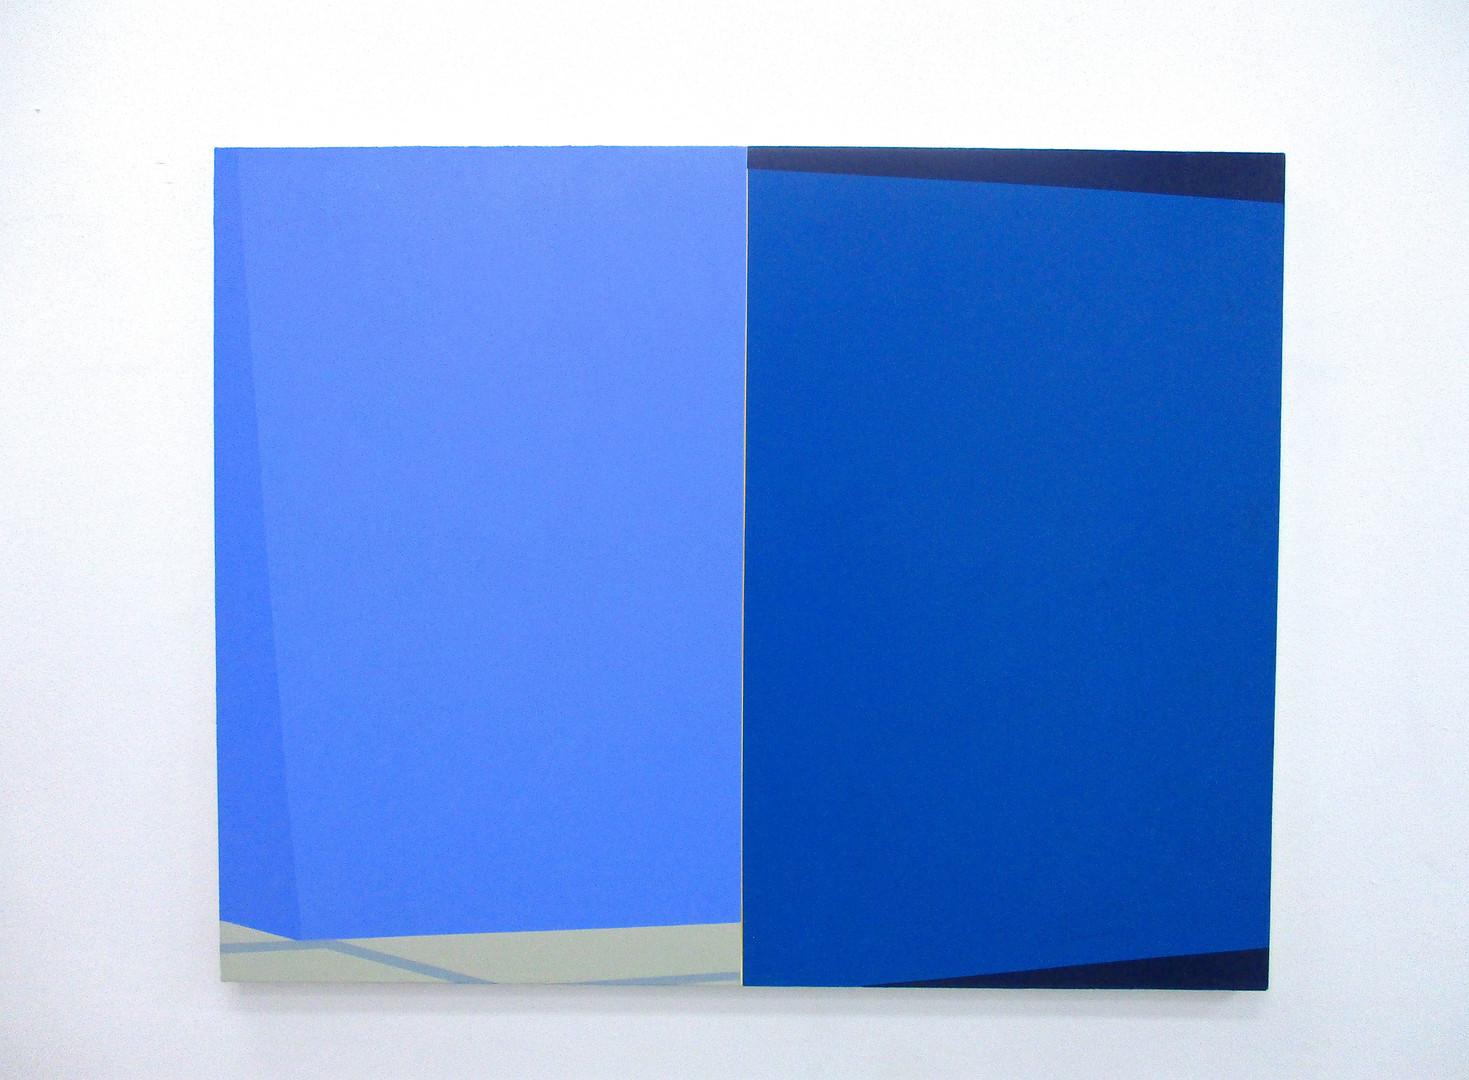 MACYN BOLT Intersect (Blue), 2017 Acrylic on canvas 38 x 48 in (Courtesy Lichtundfire)